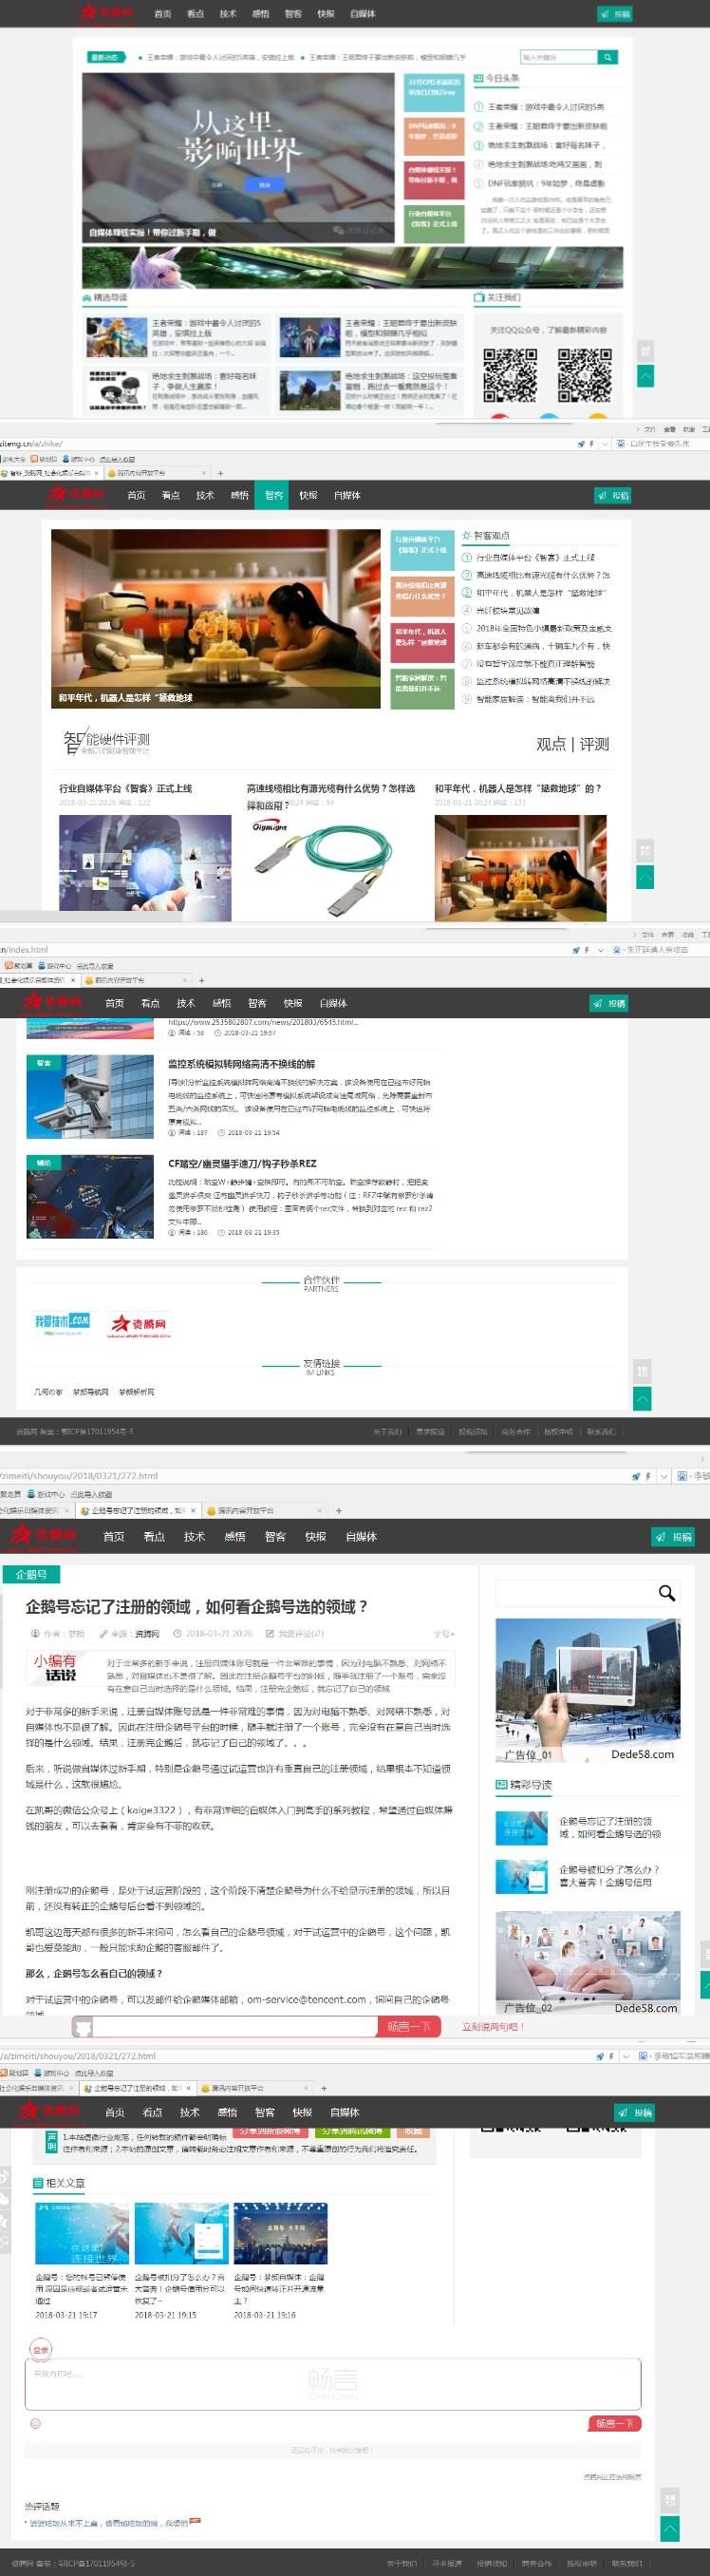 �Y�v�W整站源�a 可做博客文章�Y�教程自媒�w�W等 ���dedecms模板